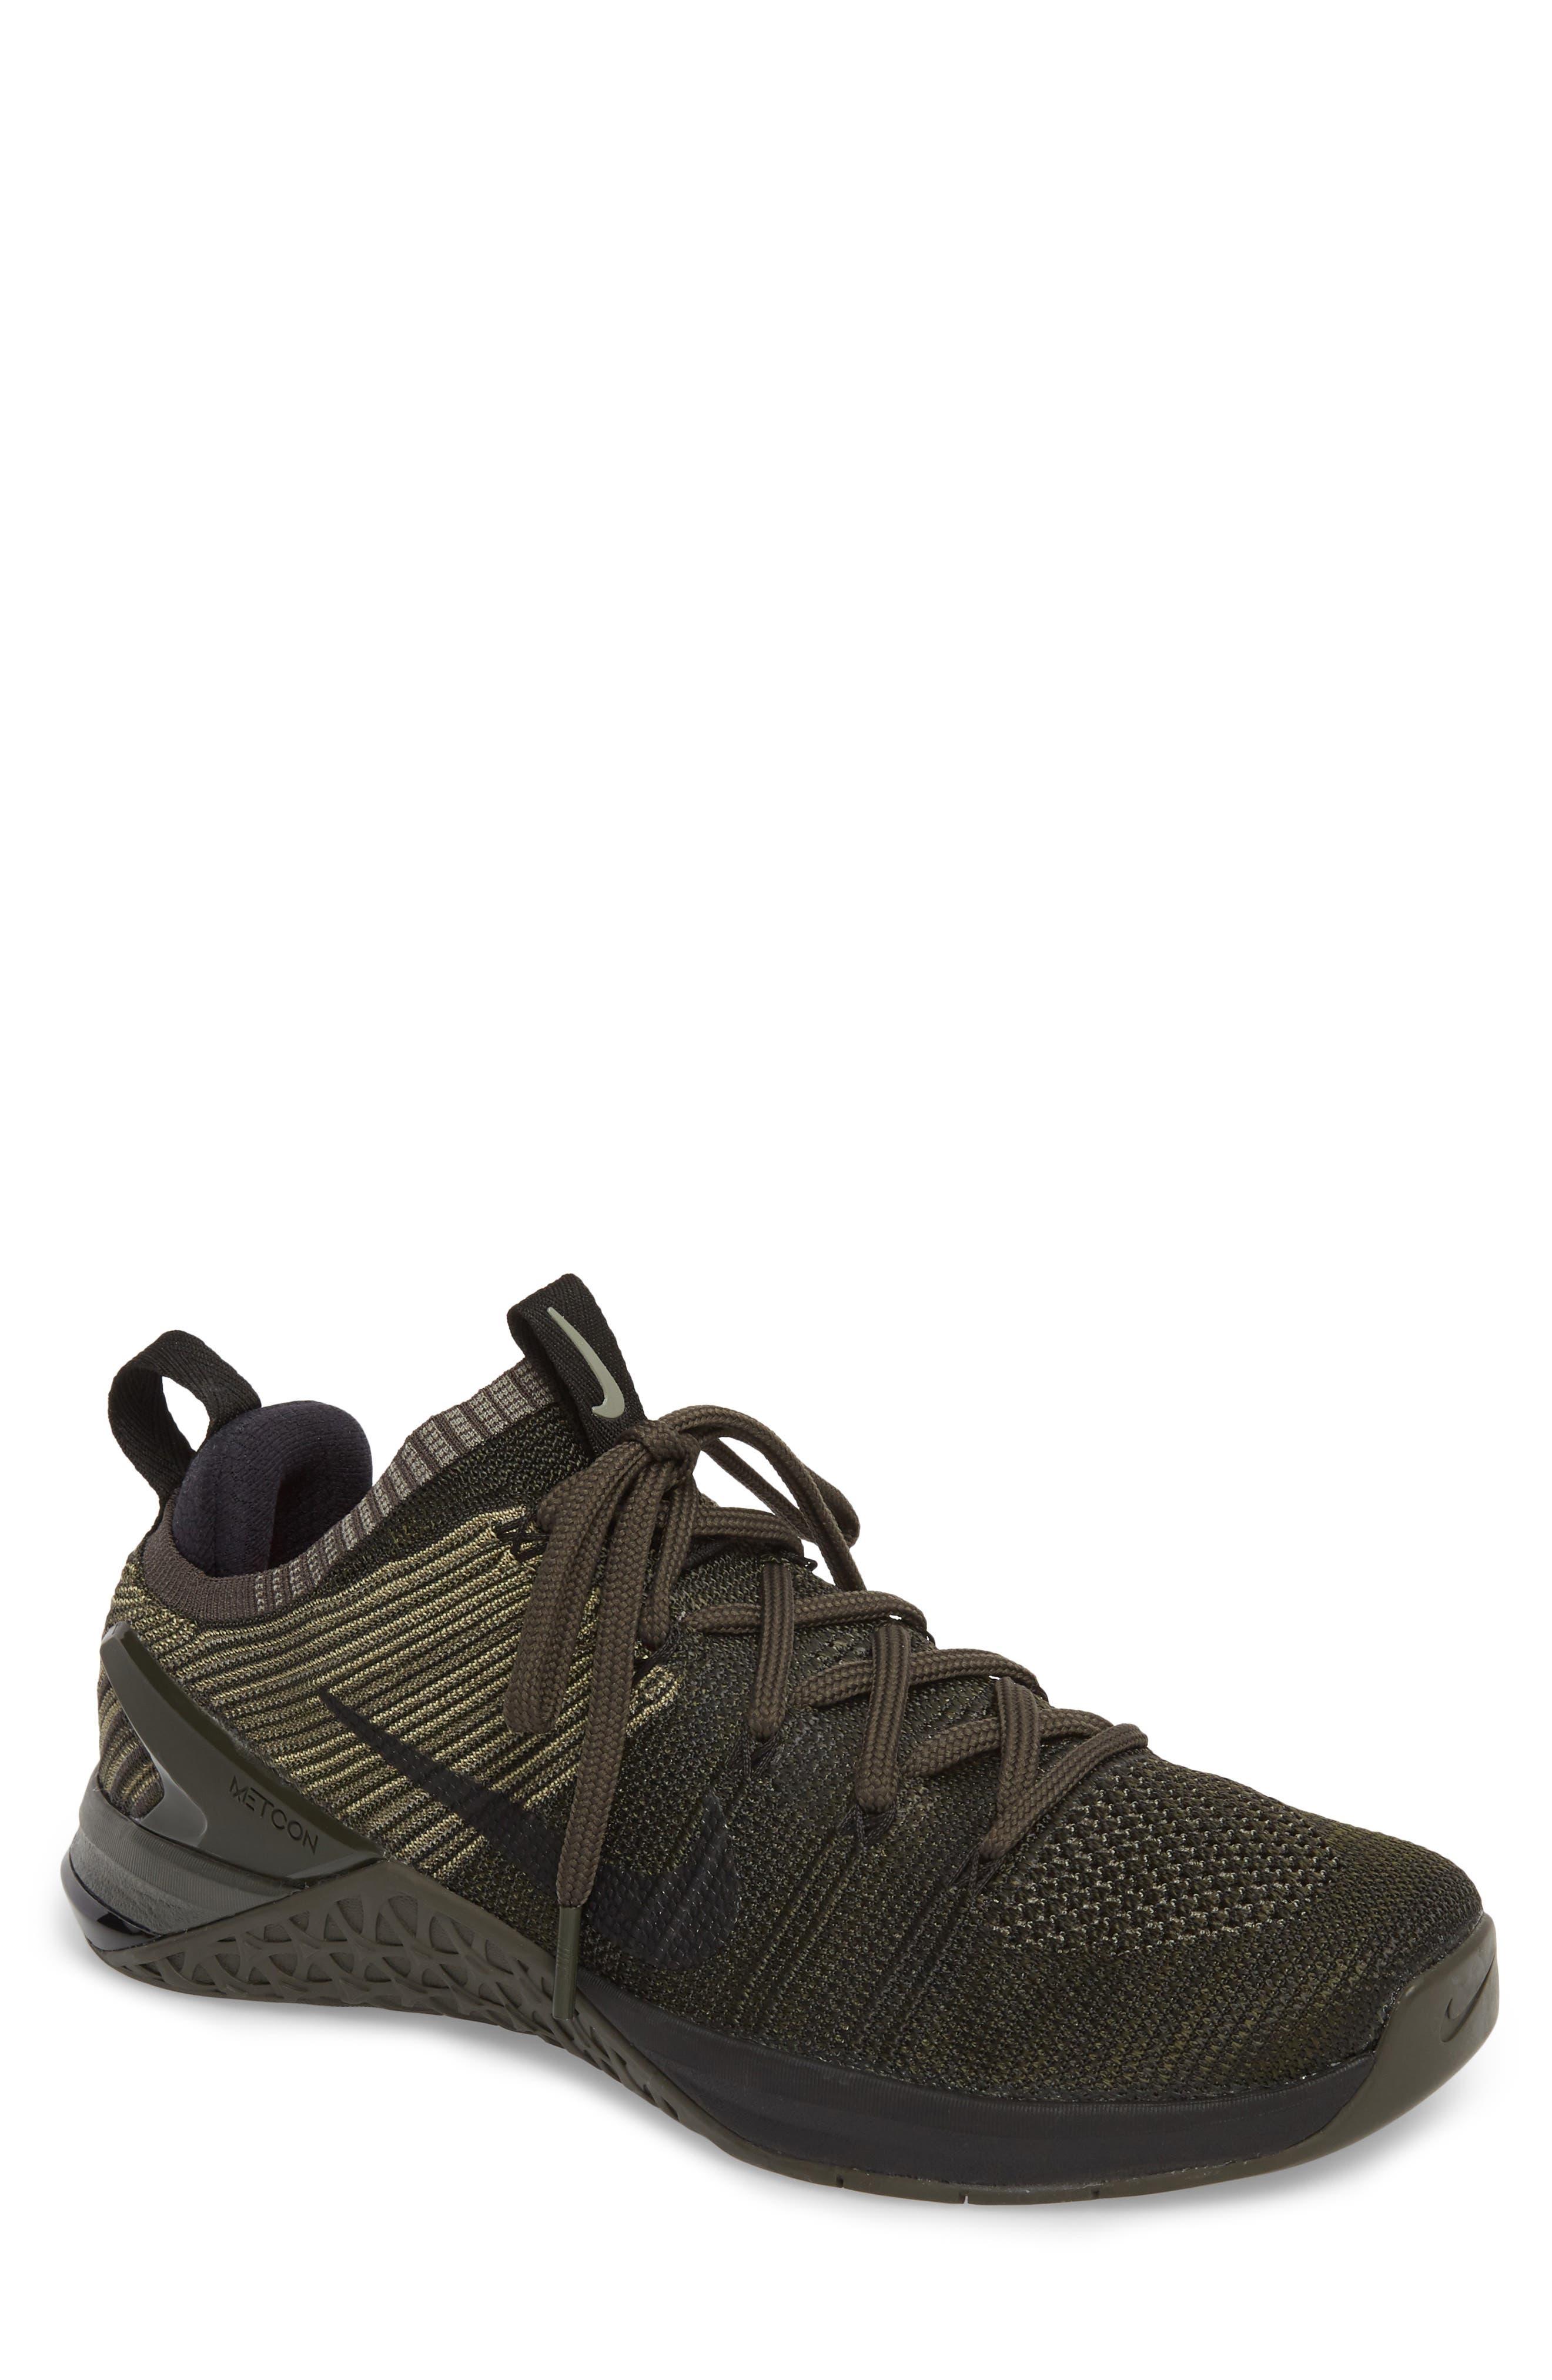 Metcon DSX Flyknit 2 Training Shoe,                             Main thumbnail 1, color,                             DARK STUCCO/ BLACK/ NEWSPRINT